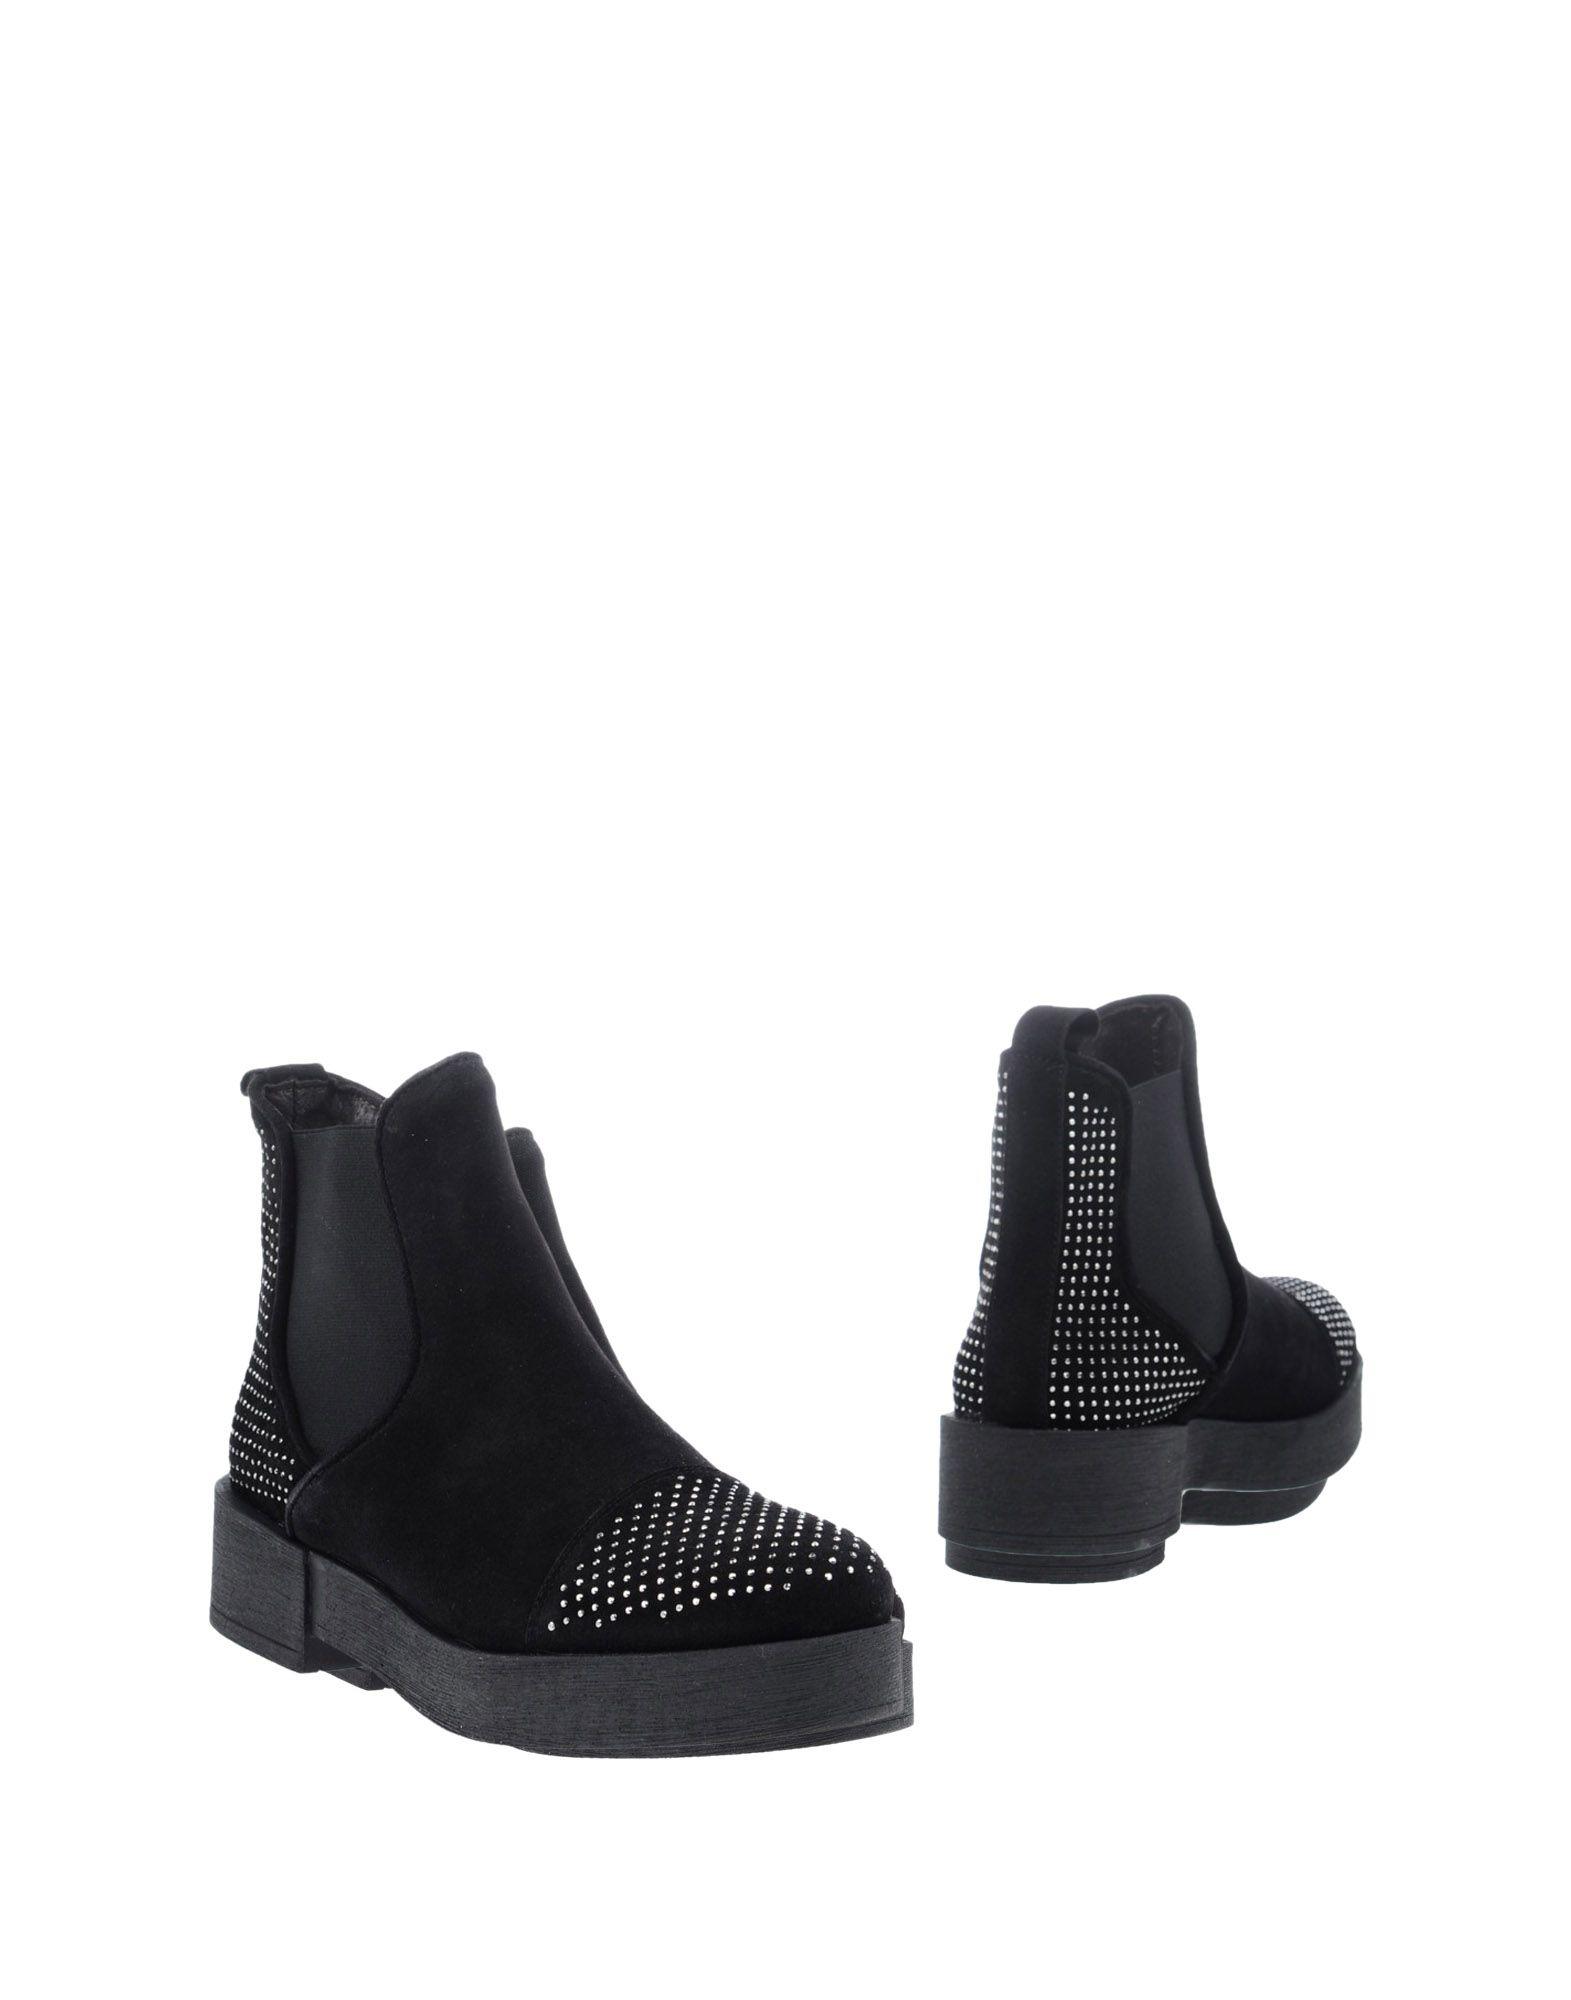 Nila & Nila Chelsea Boots Damen  11266182GJ Gute Qualität beliebte Schuhe